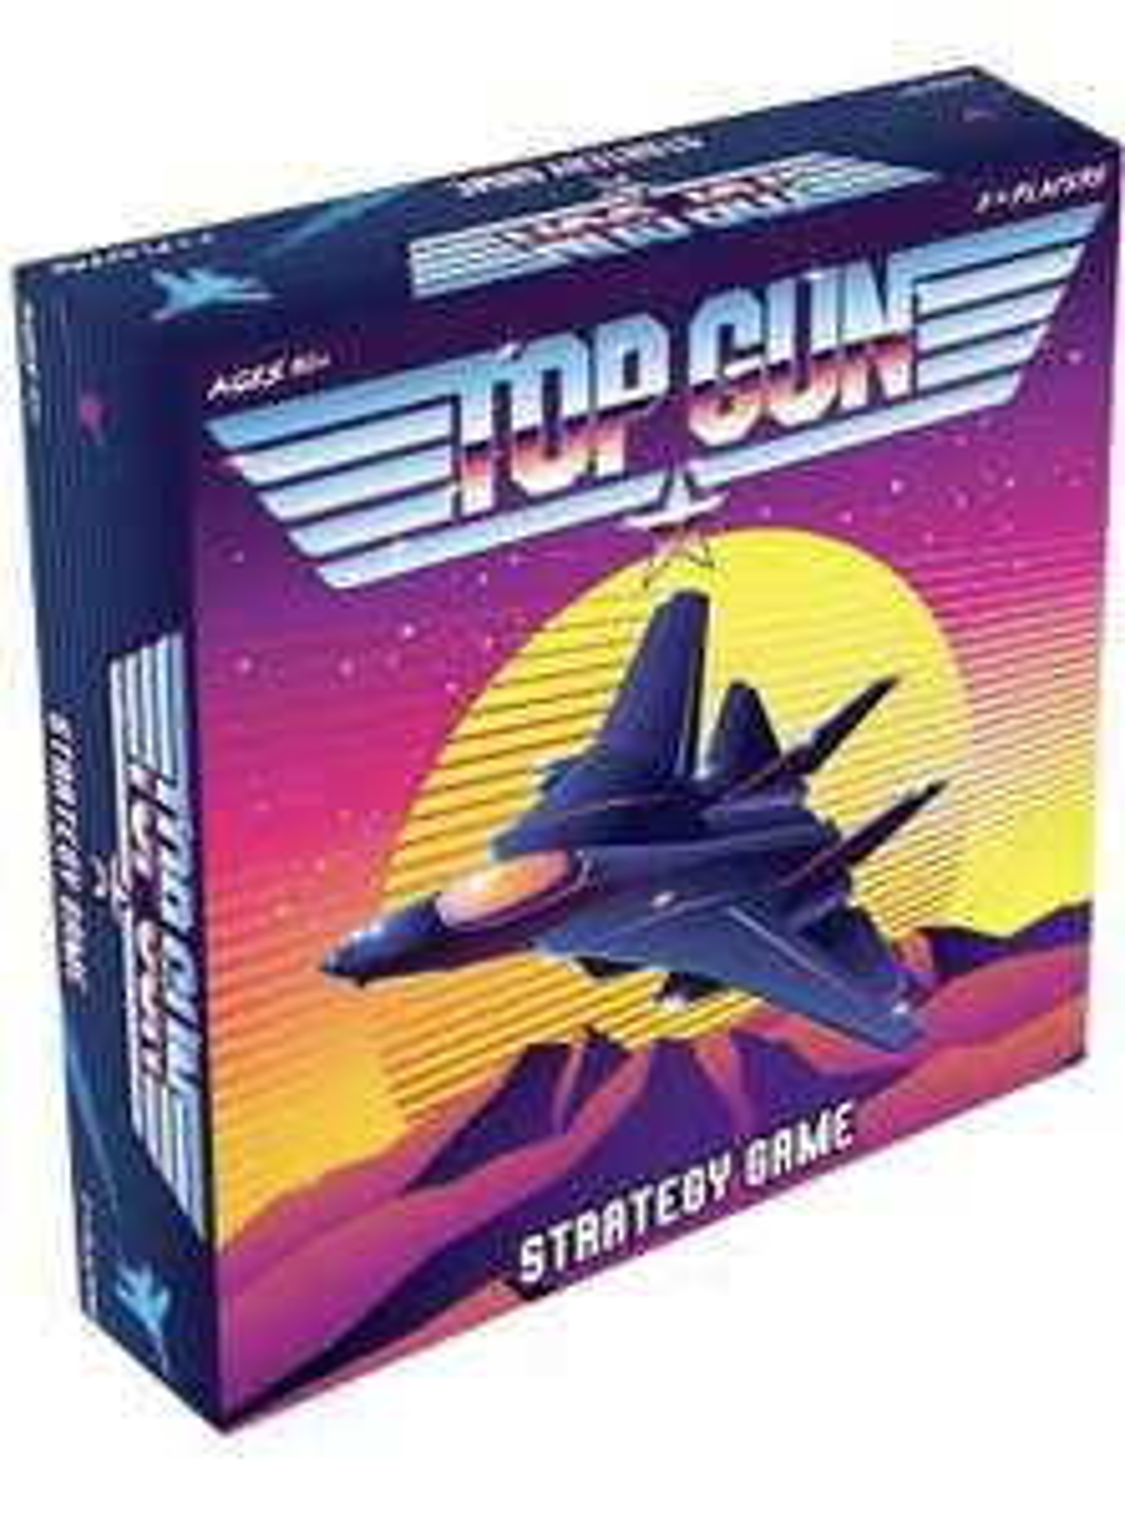 Top Gun board game £10.71 (Prime Exclusive) @ Amazon